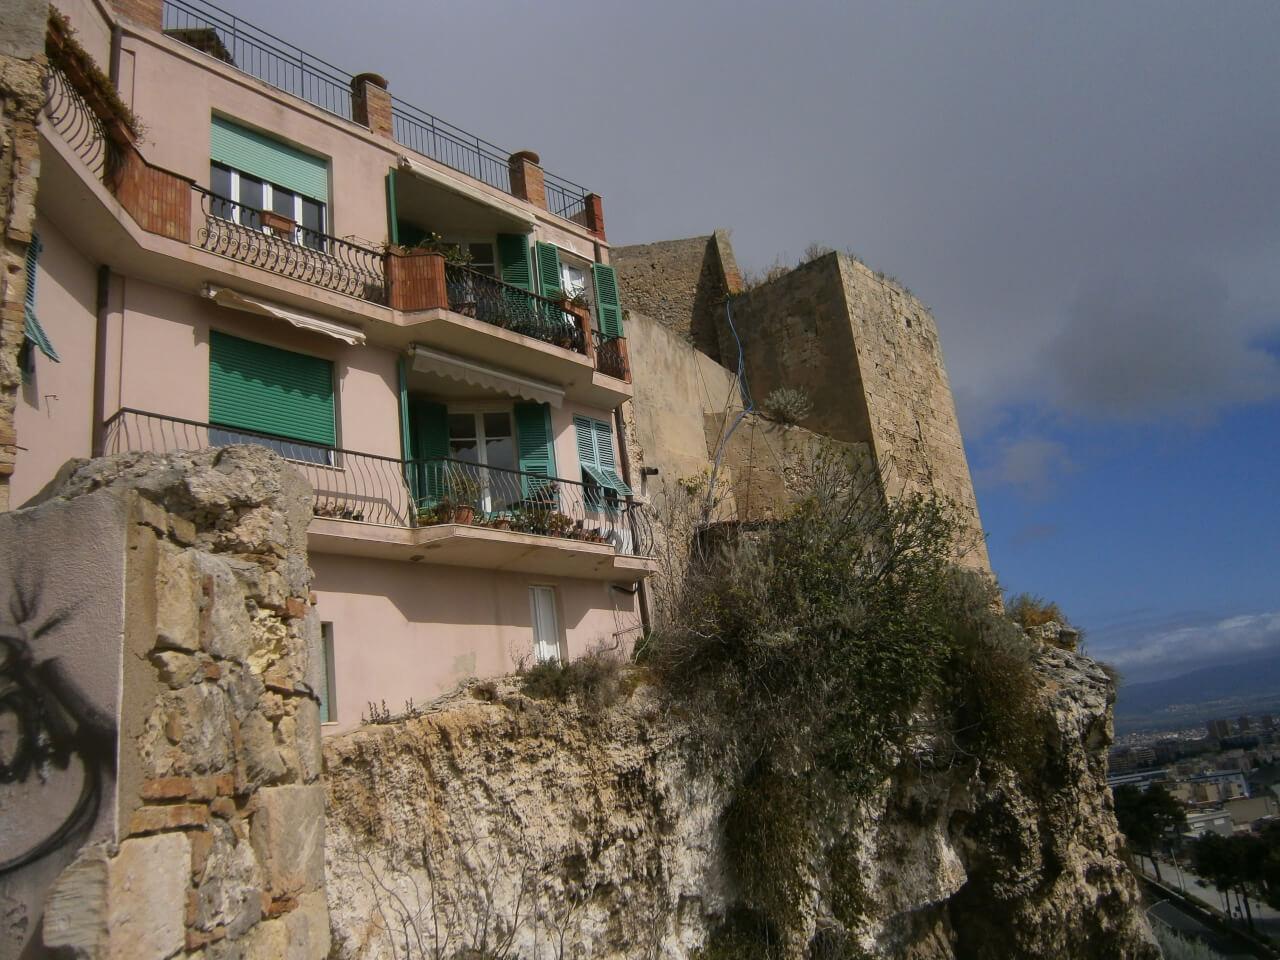 Immersive Italian: A trip to Sardinia